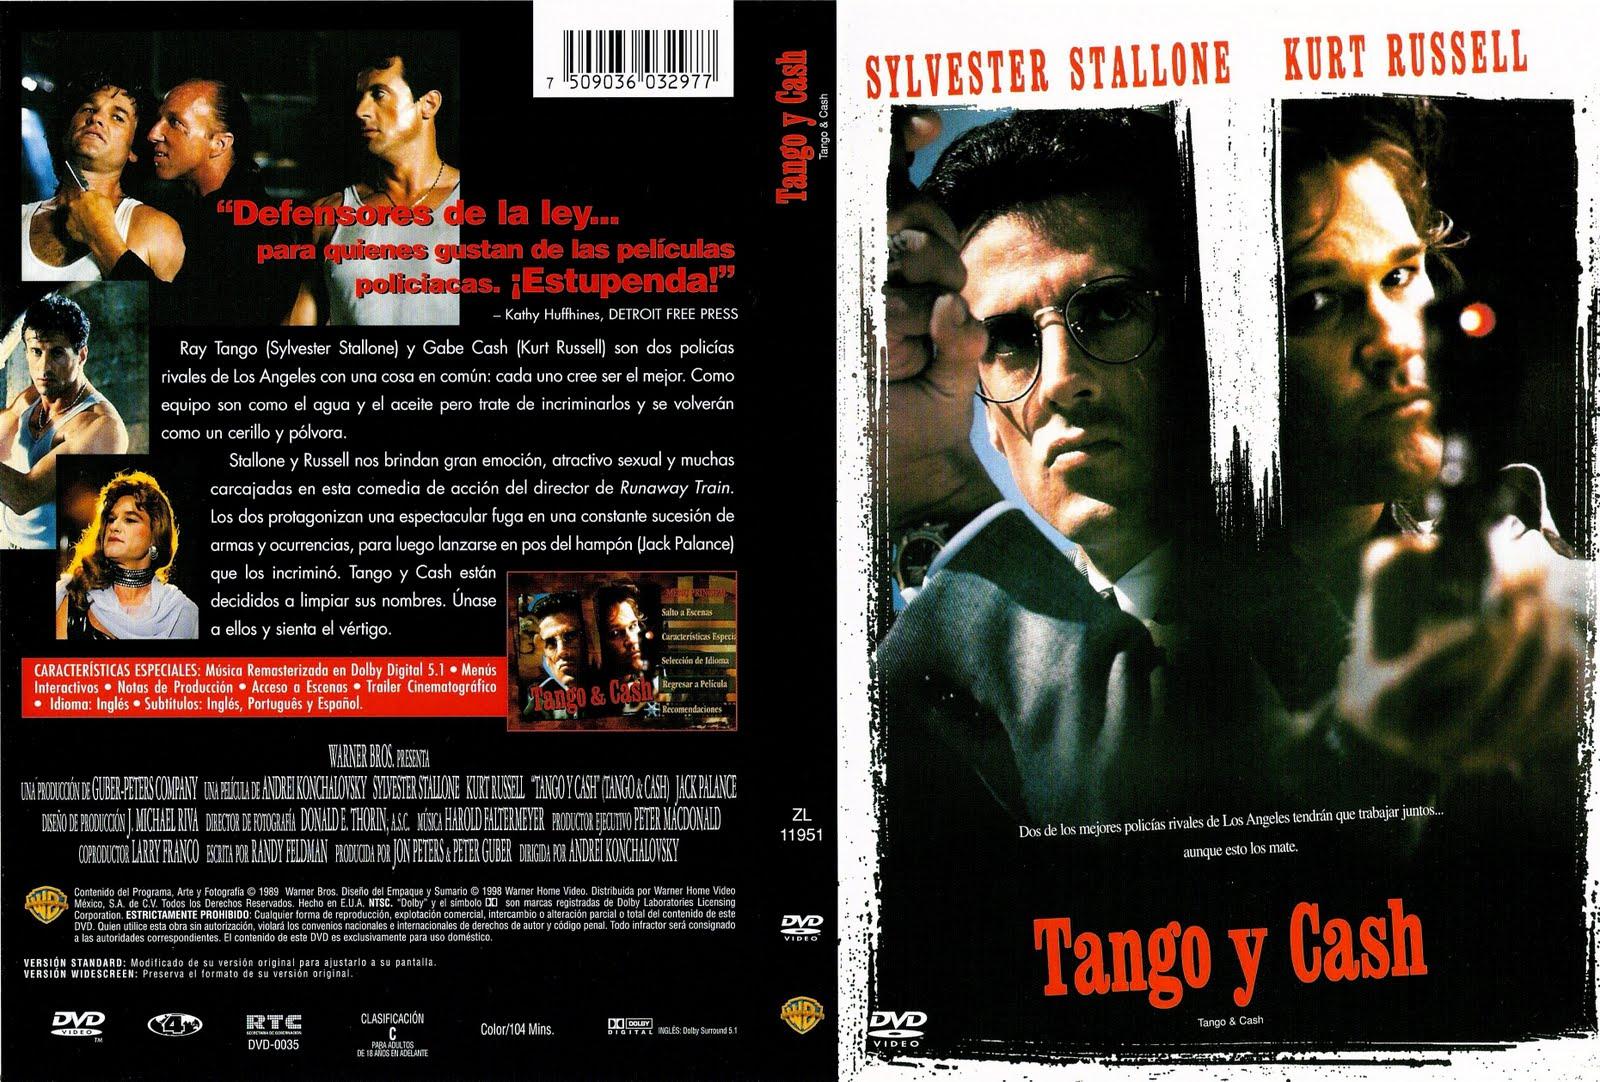 http://4.bp.blogspot.com/-nfPc5NawbJ8/TjXgKgiGFVI/AAAAAAAACIk/y6W4ZNgToRA/s1600/tango%2By%2Bcash.jpg